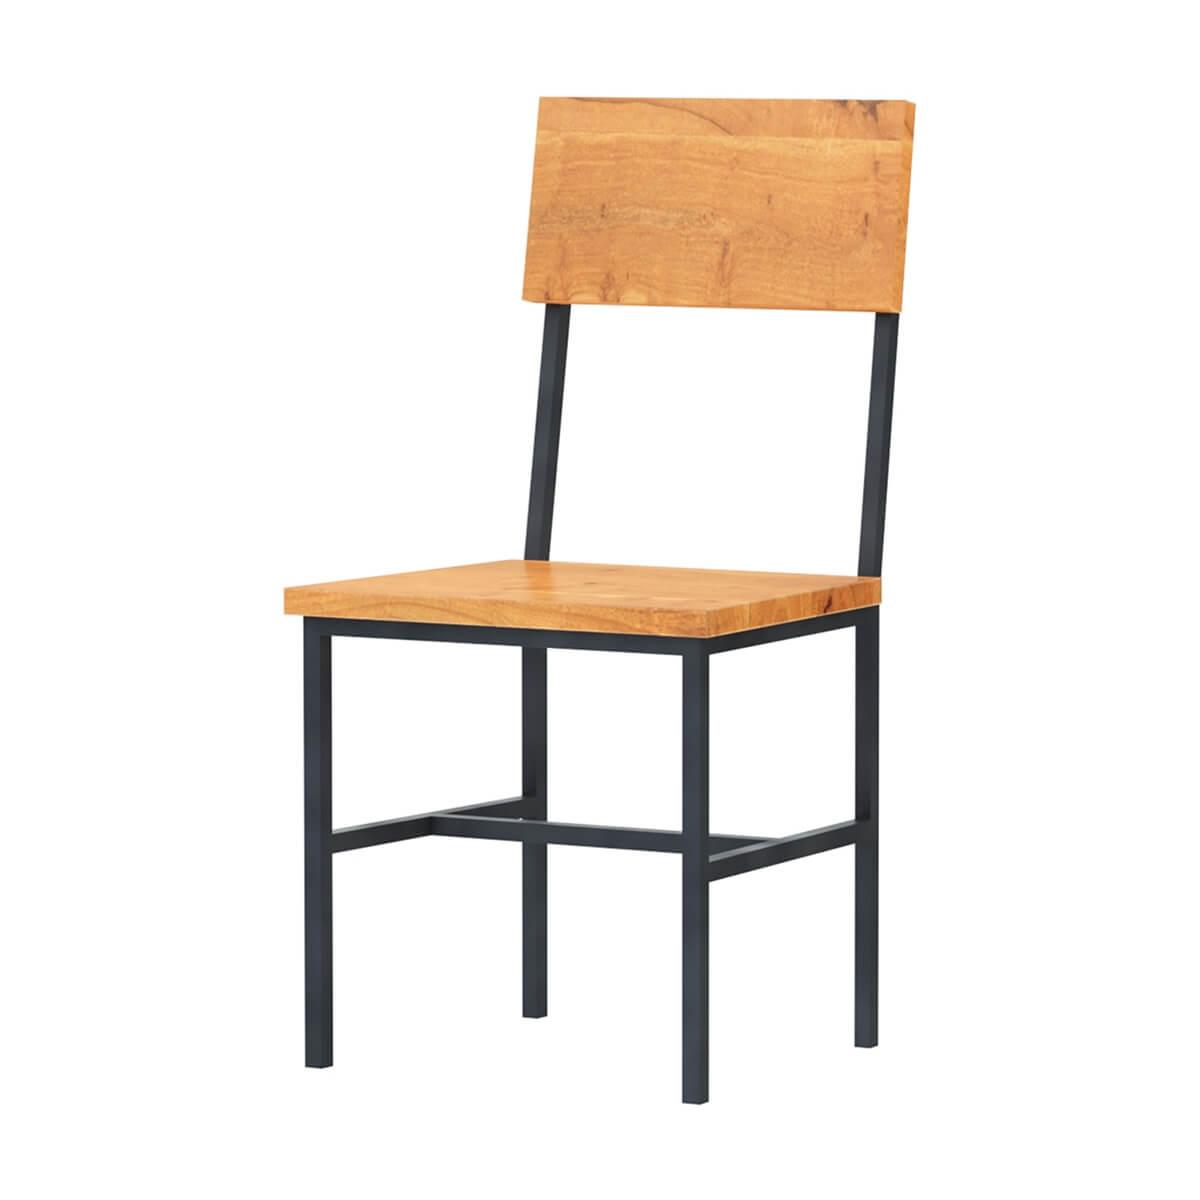 Karval Rustic Solid Wood Industrial Dining Chair